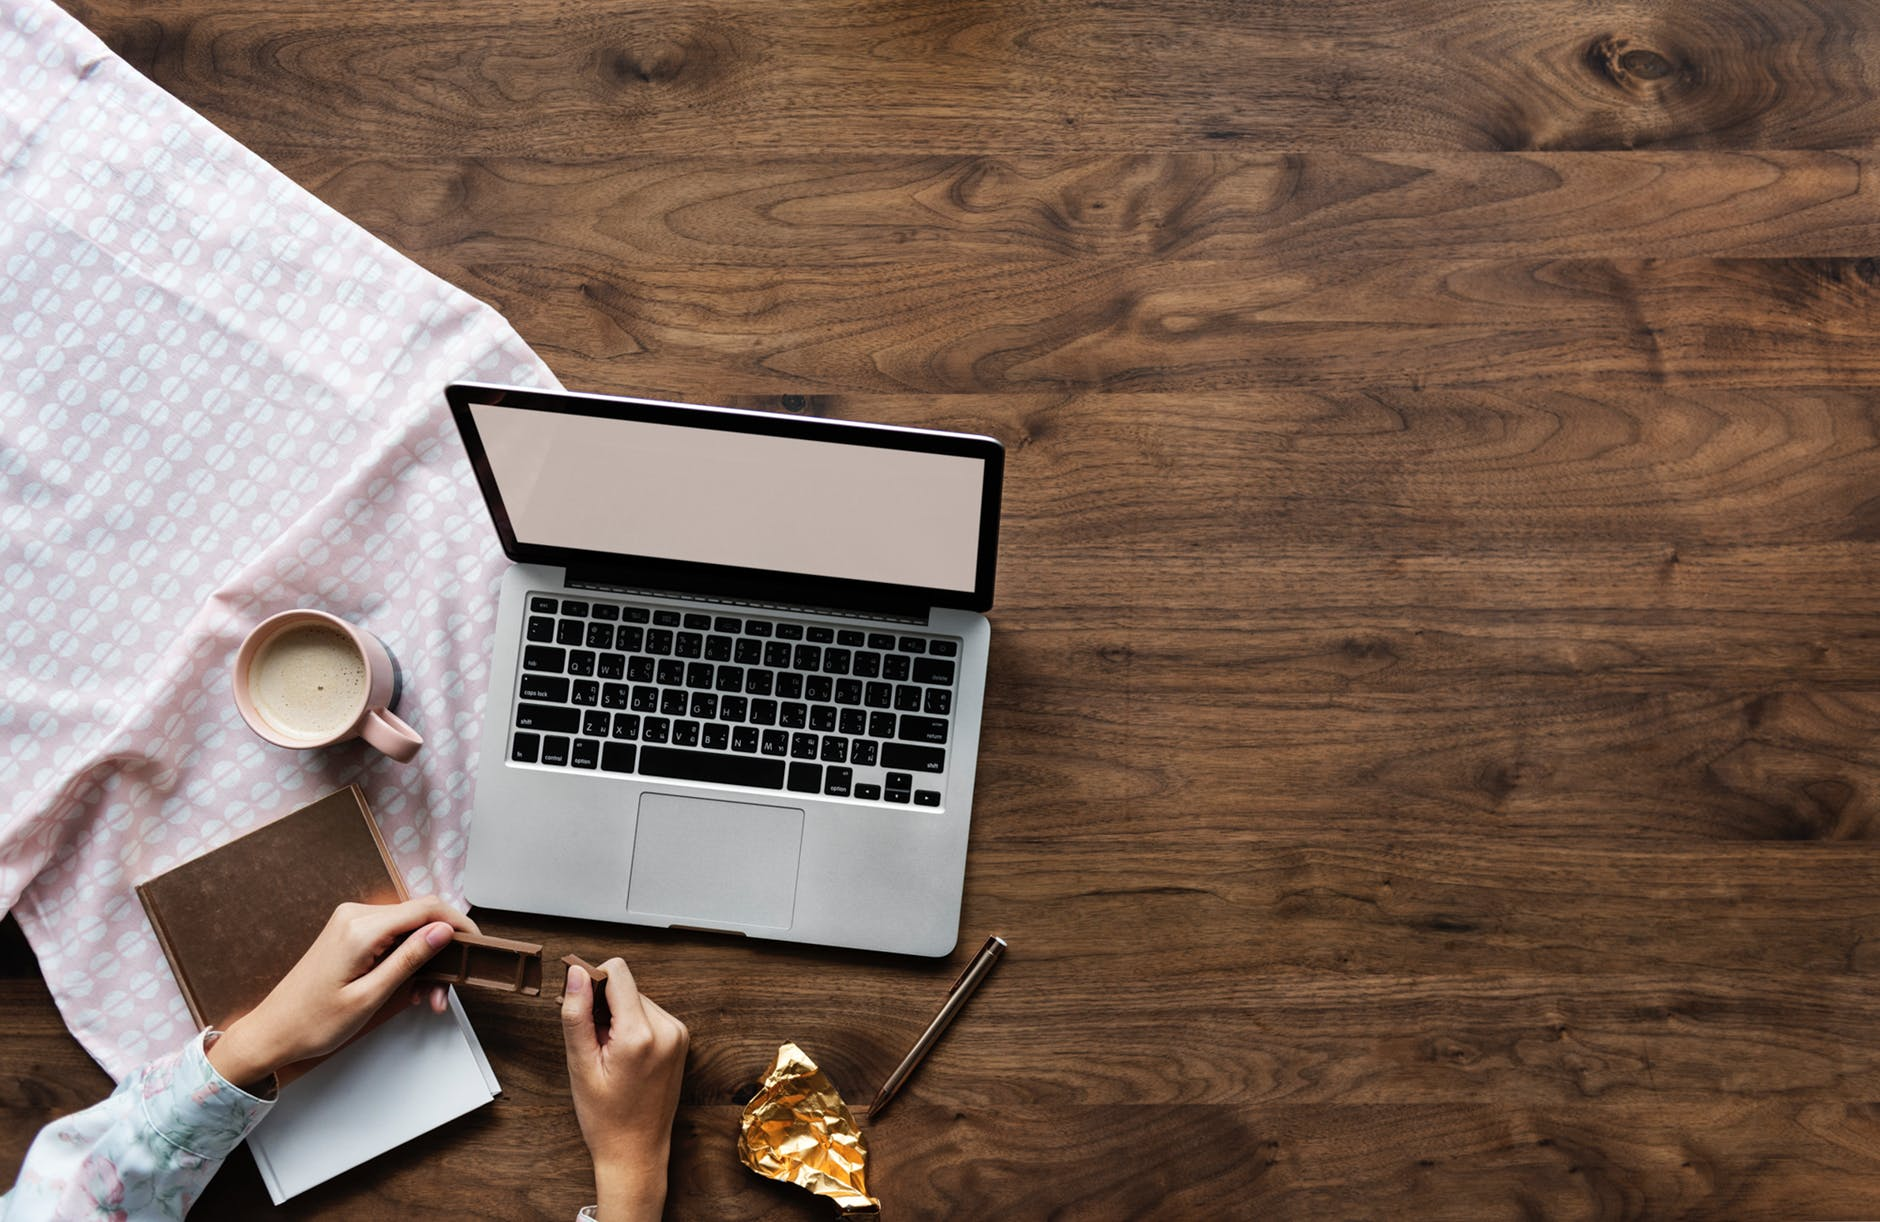 person holding chocolate bar near laptop